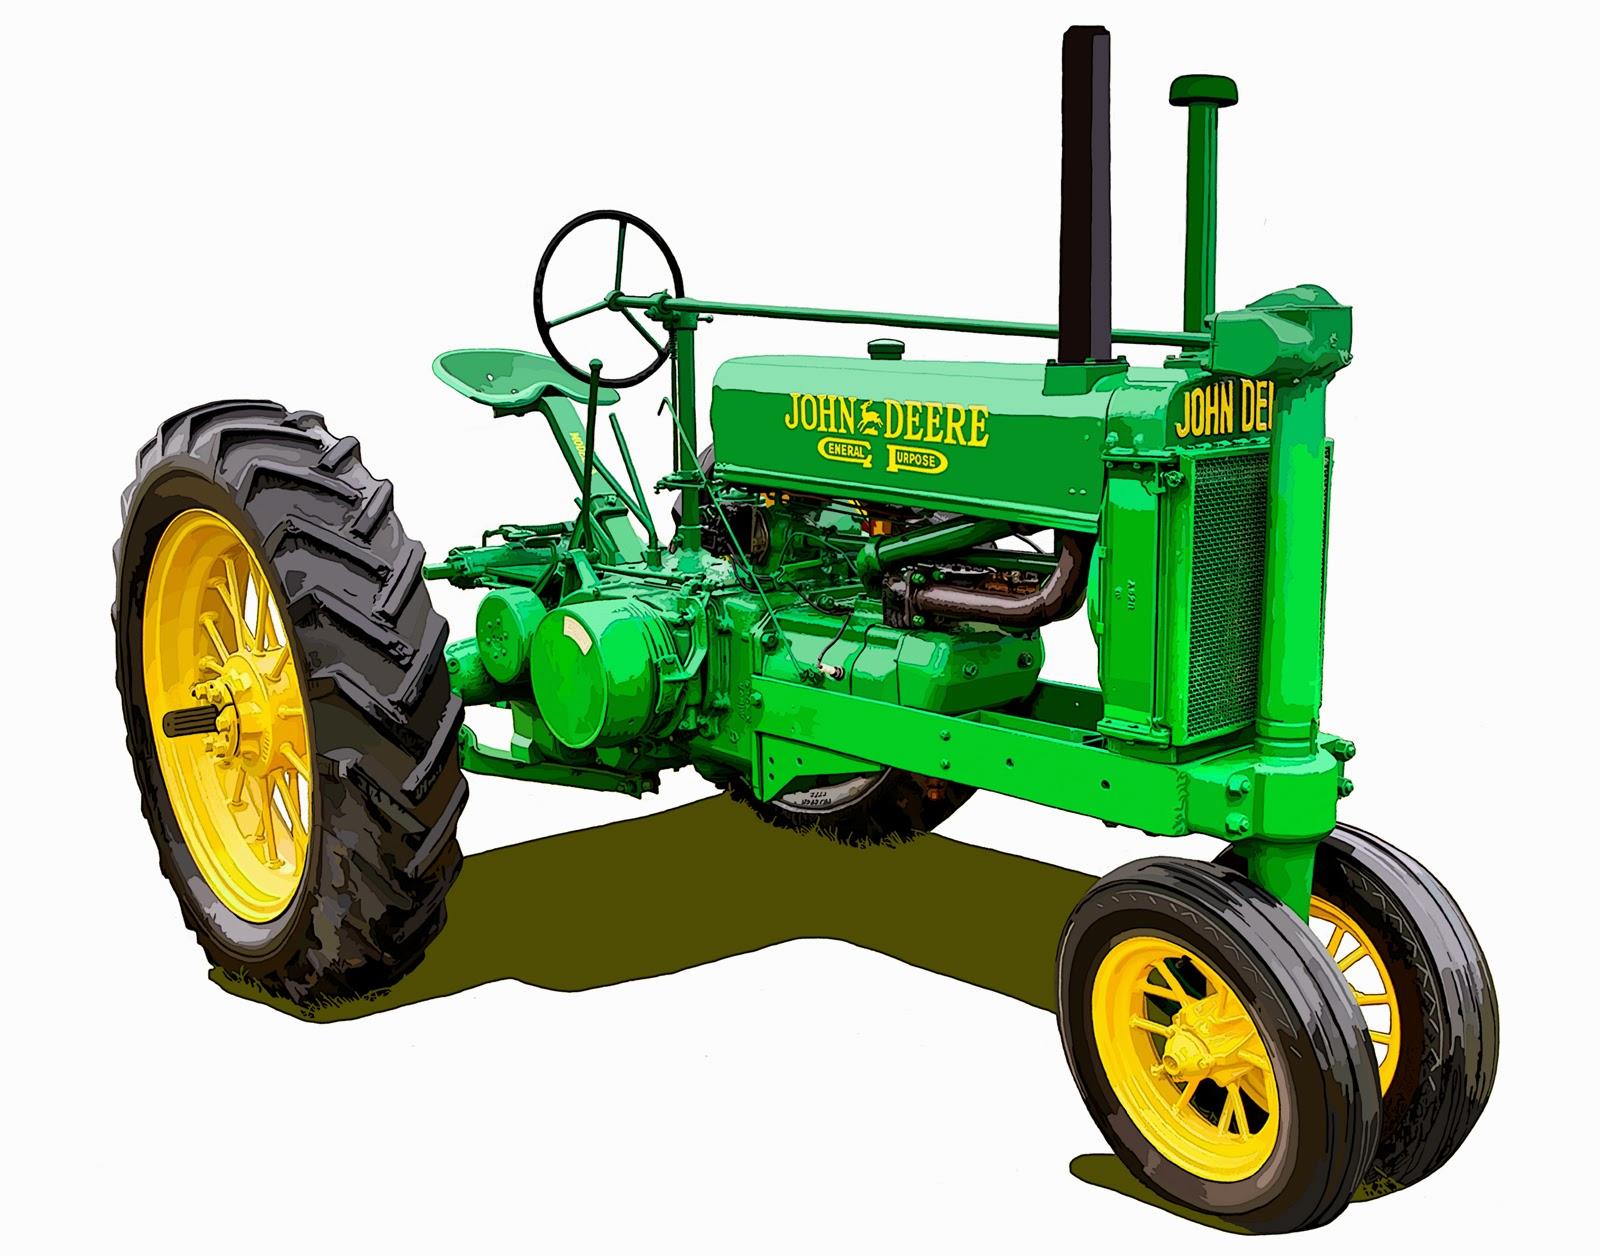 The Oldest John Deere : The john deere model a tractor